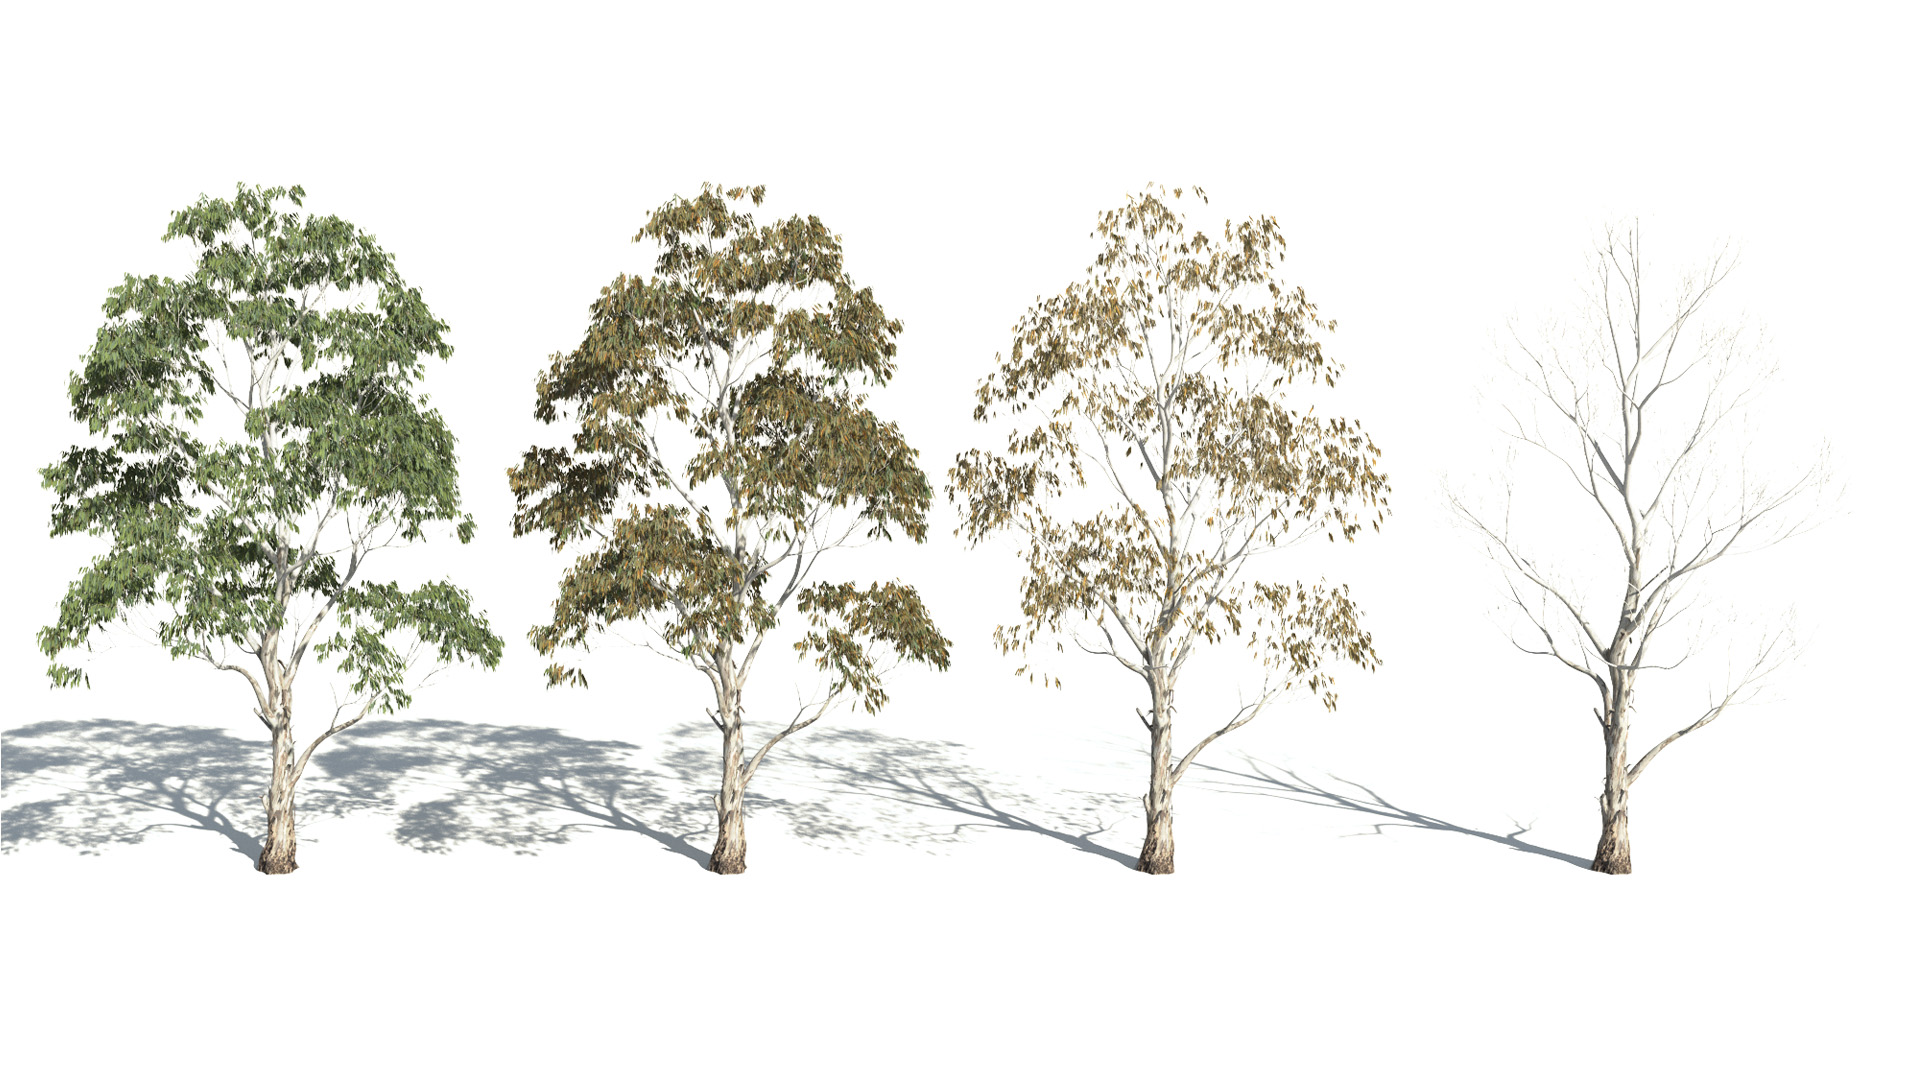 3D model of the Red river gum Eucalyptus camaldulensis health variations